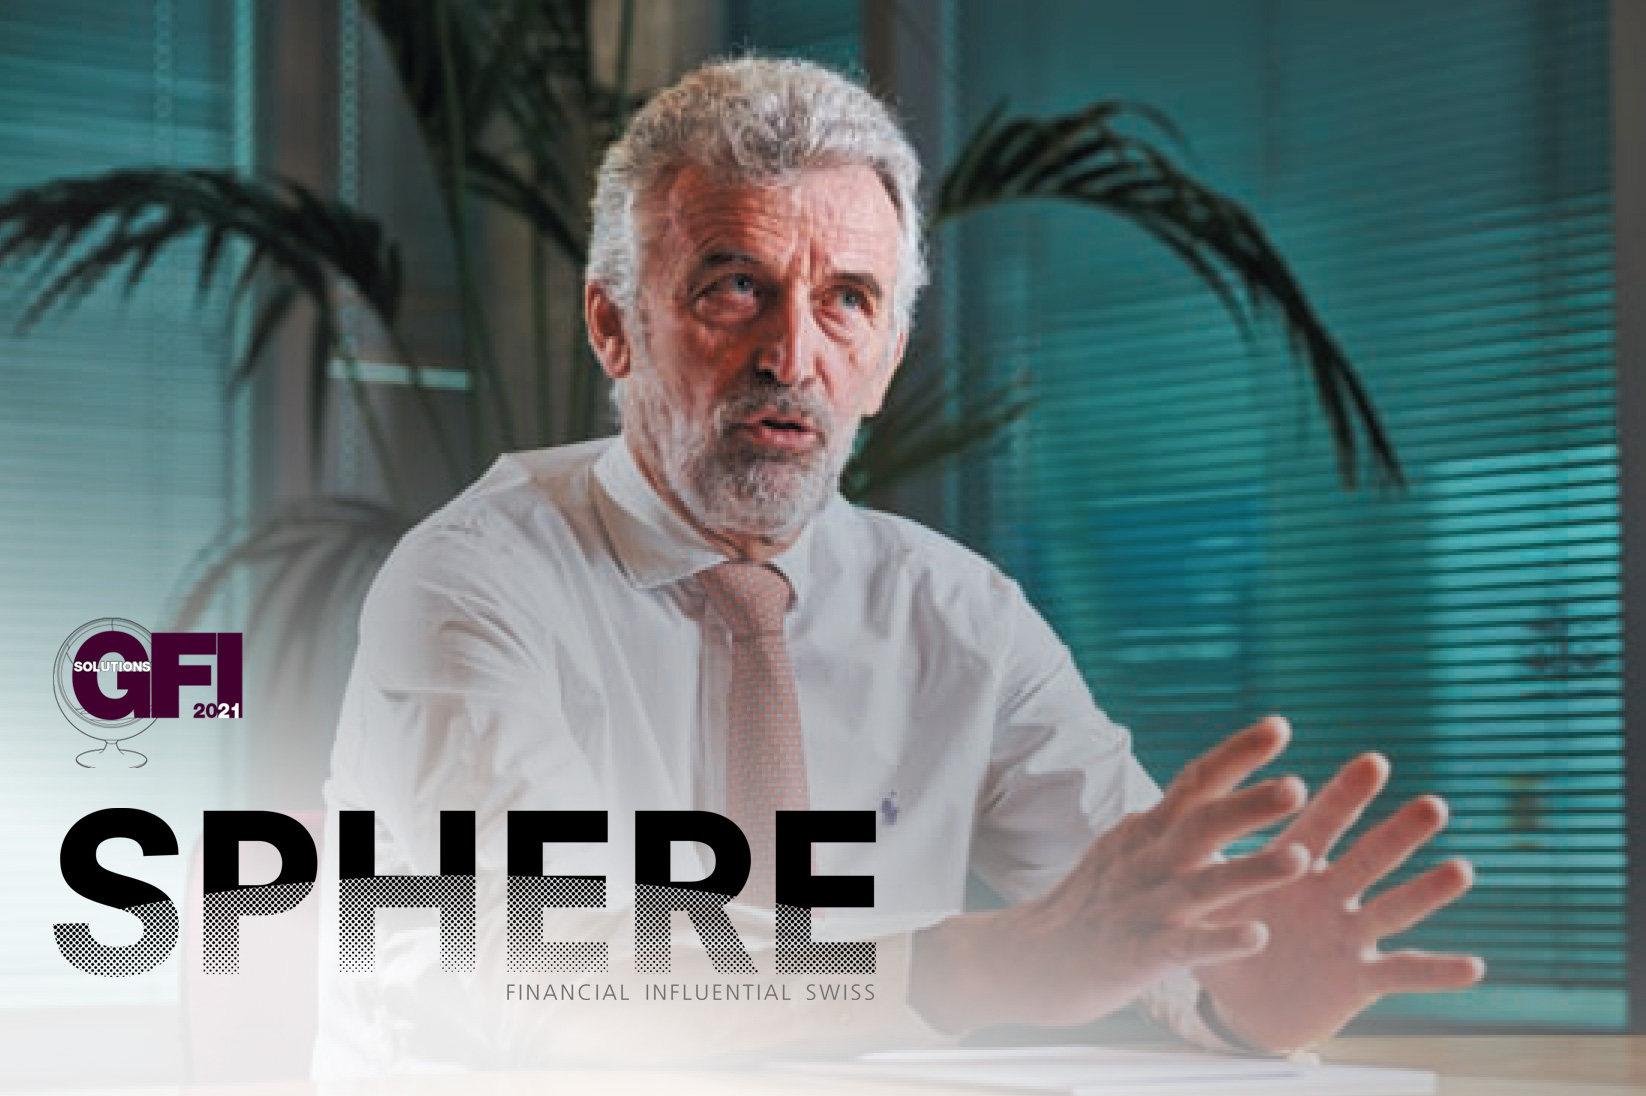 ISFB_institut_superieur_formation_bancaire_actualite_interview_frederic_kohler_sphere_2021_vignette